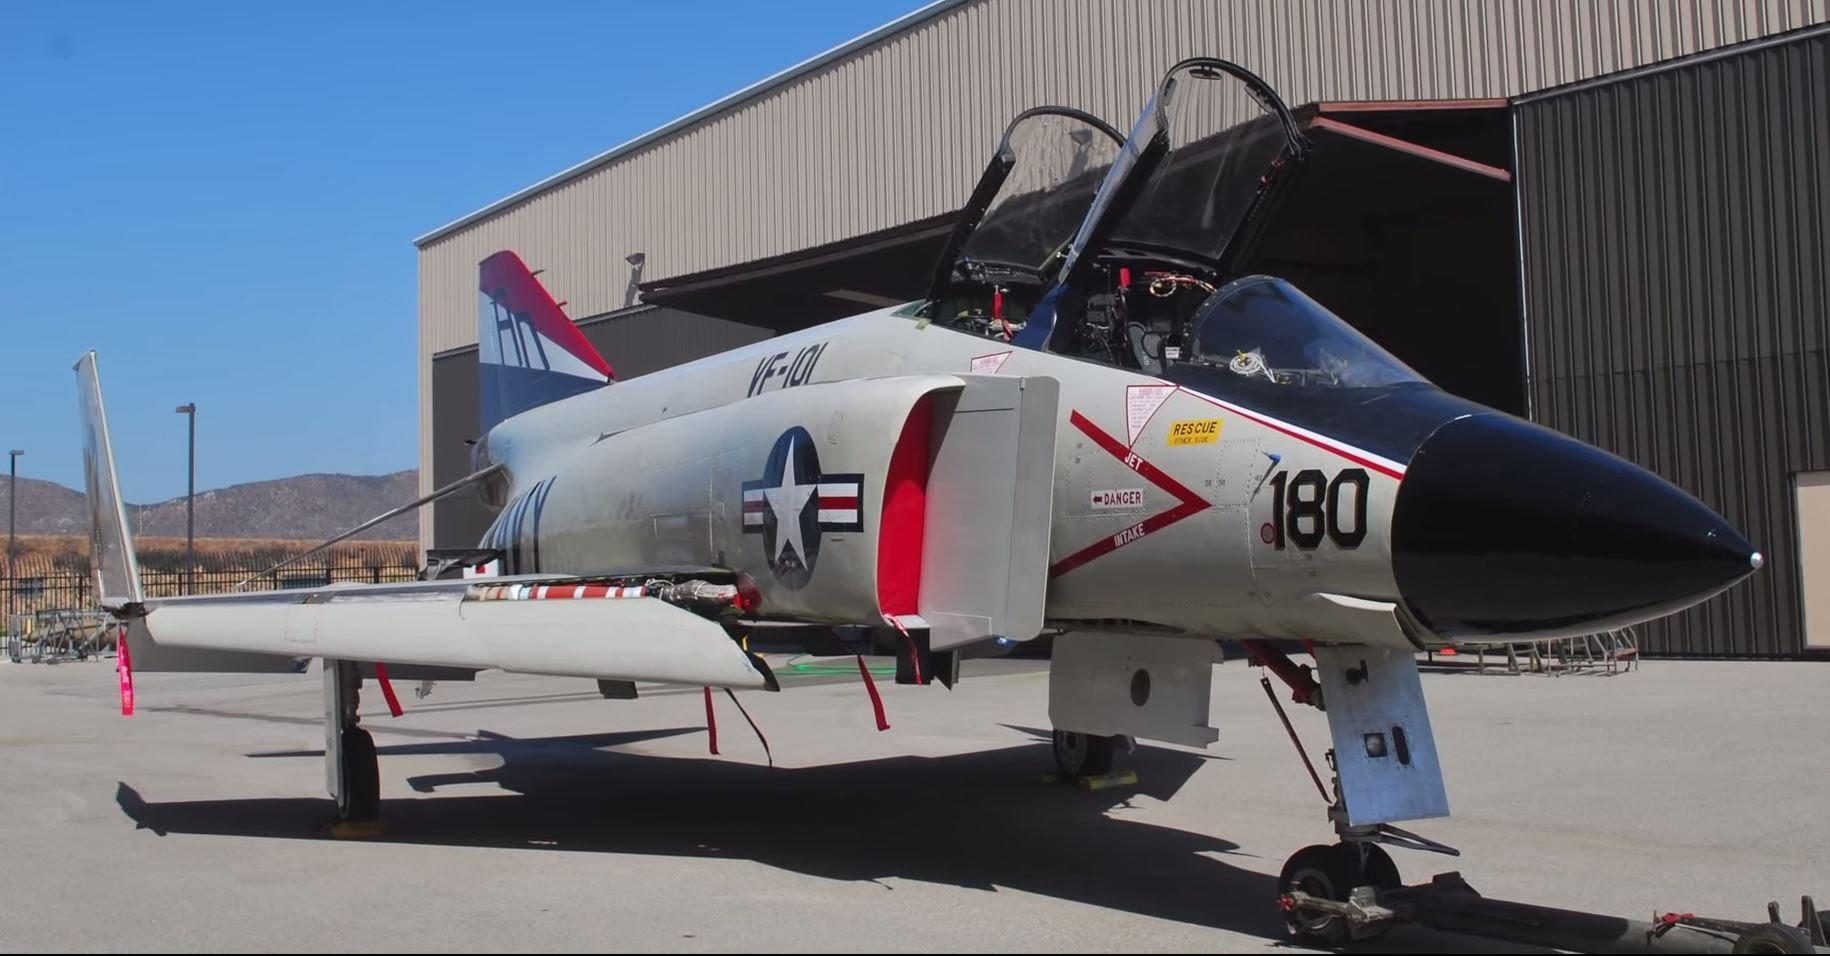 The restored F-4 Phantom